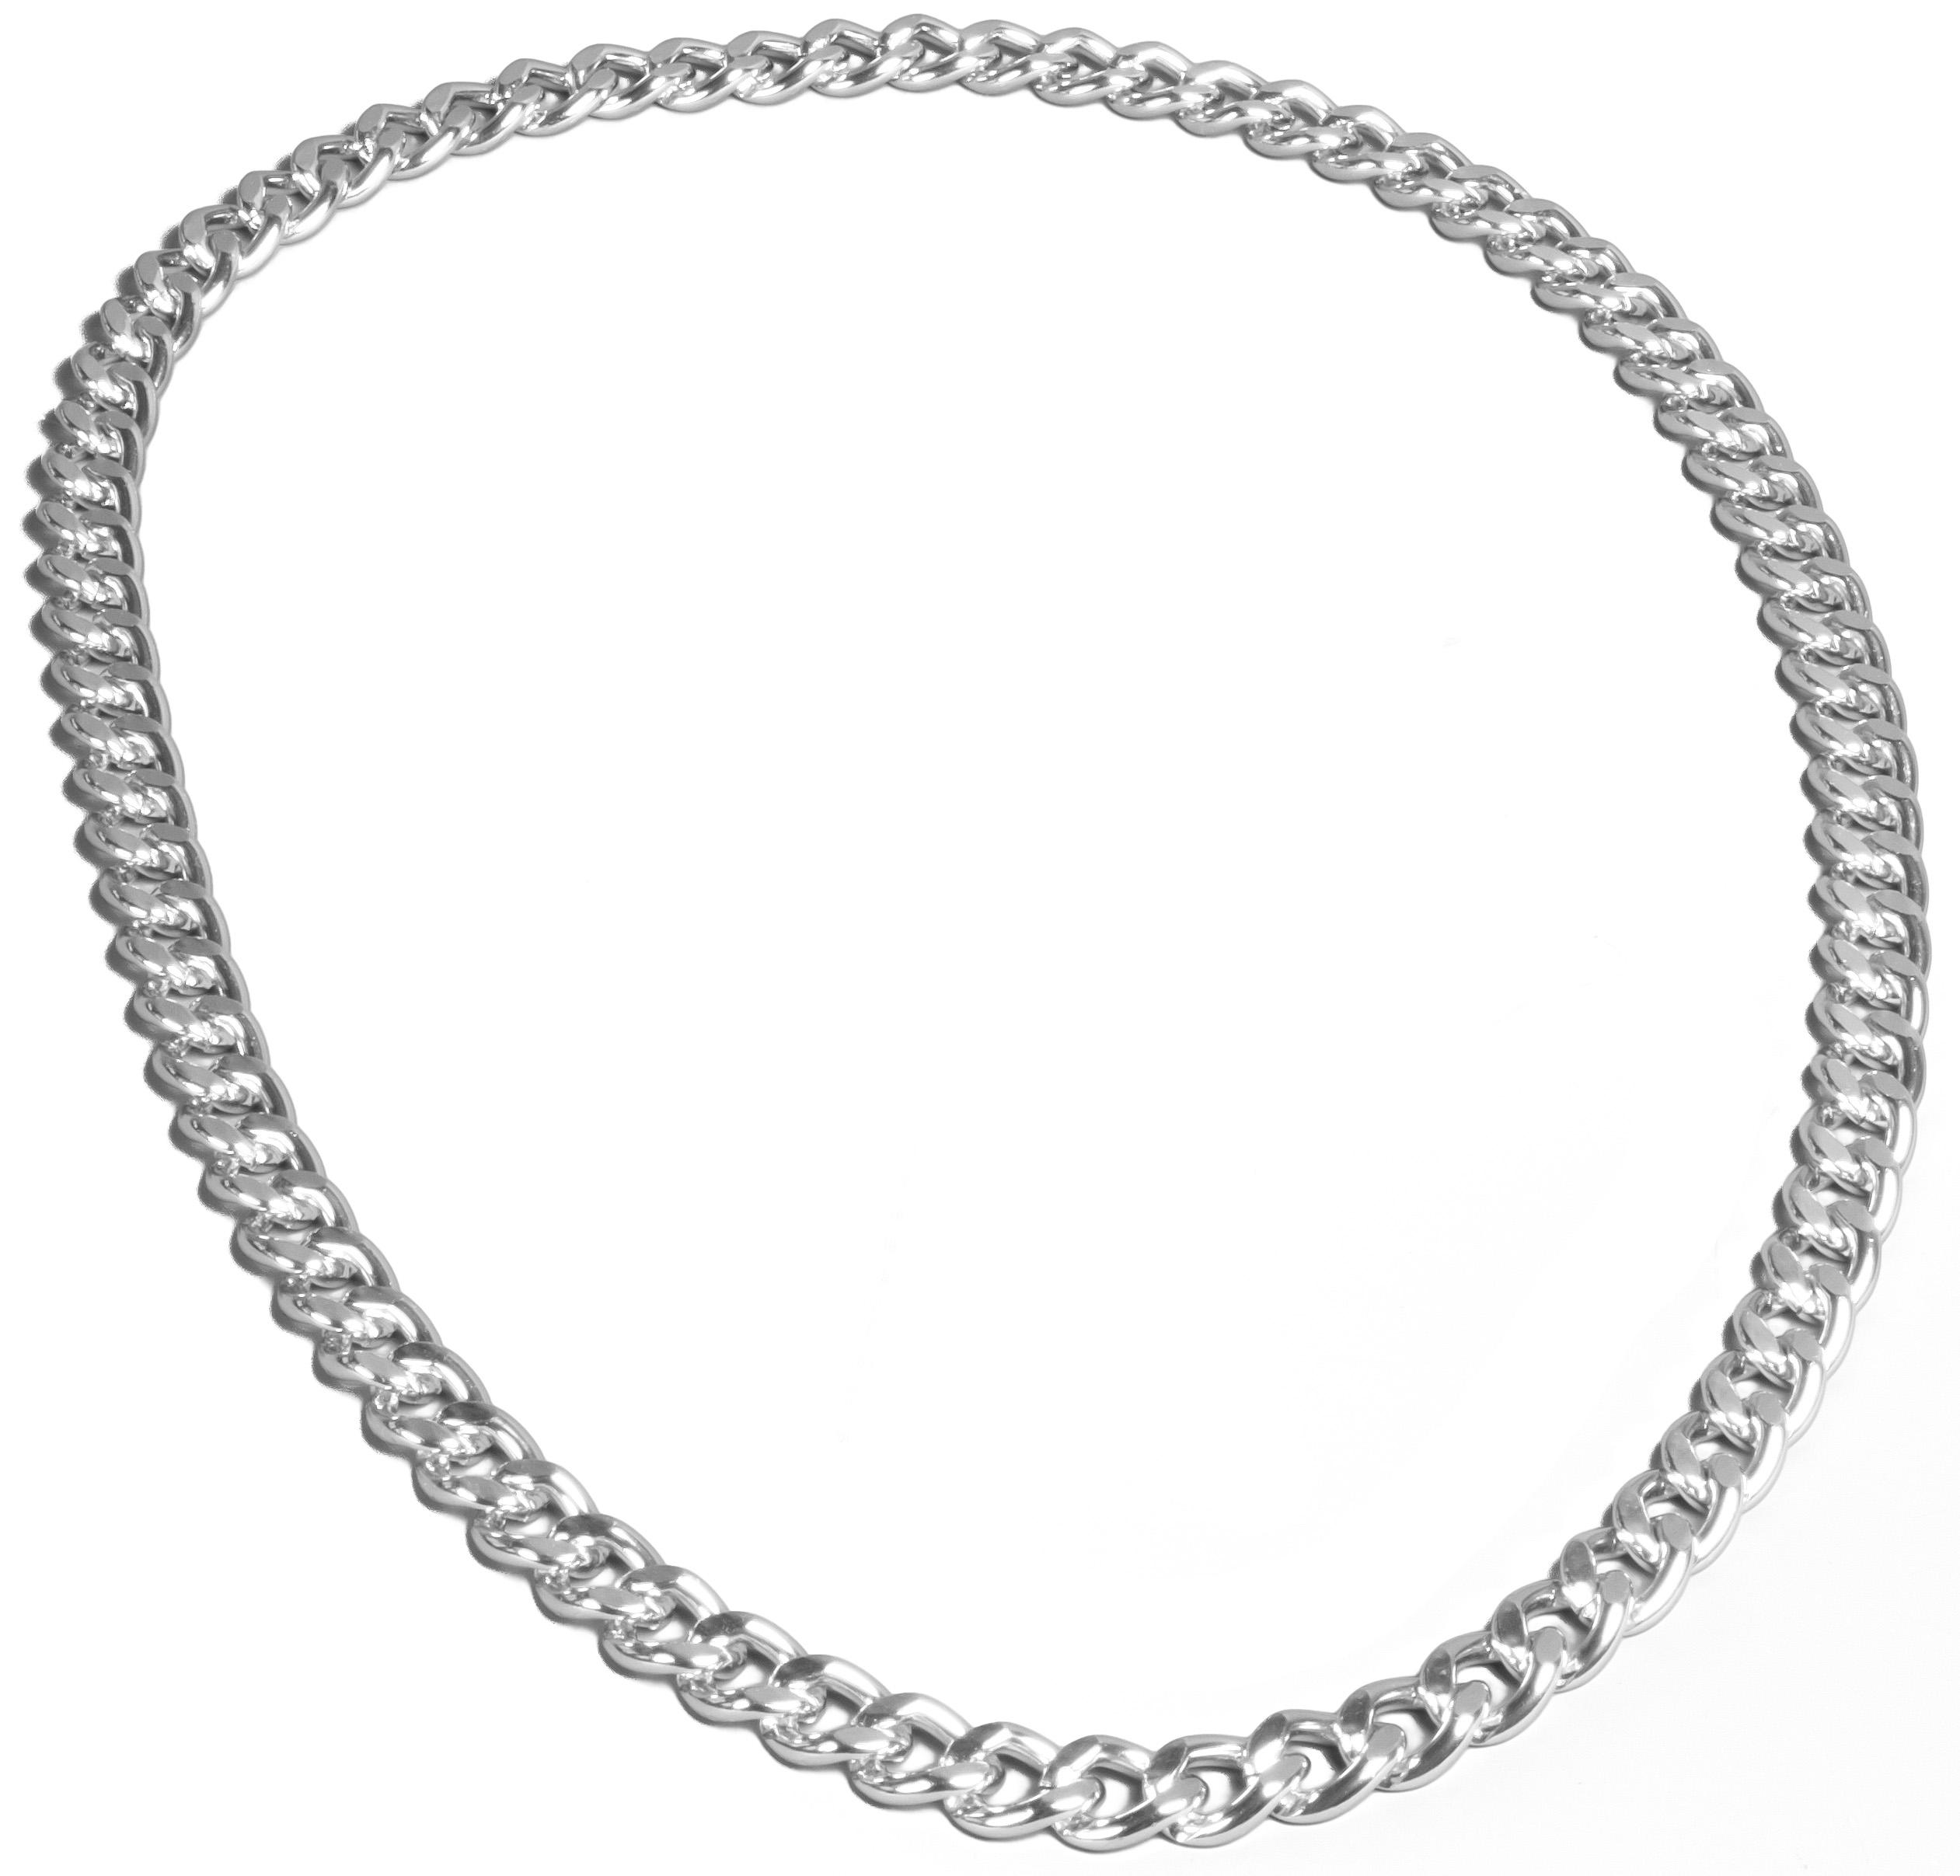 Silberkette deluxe